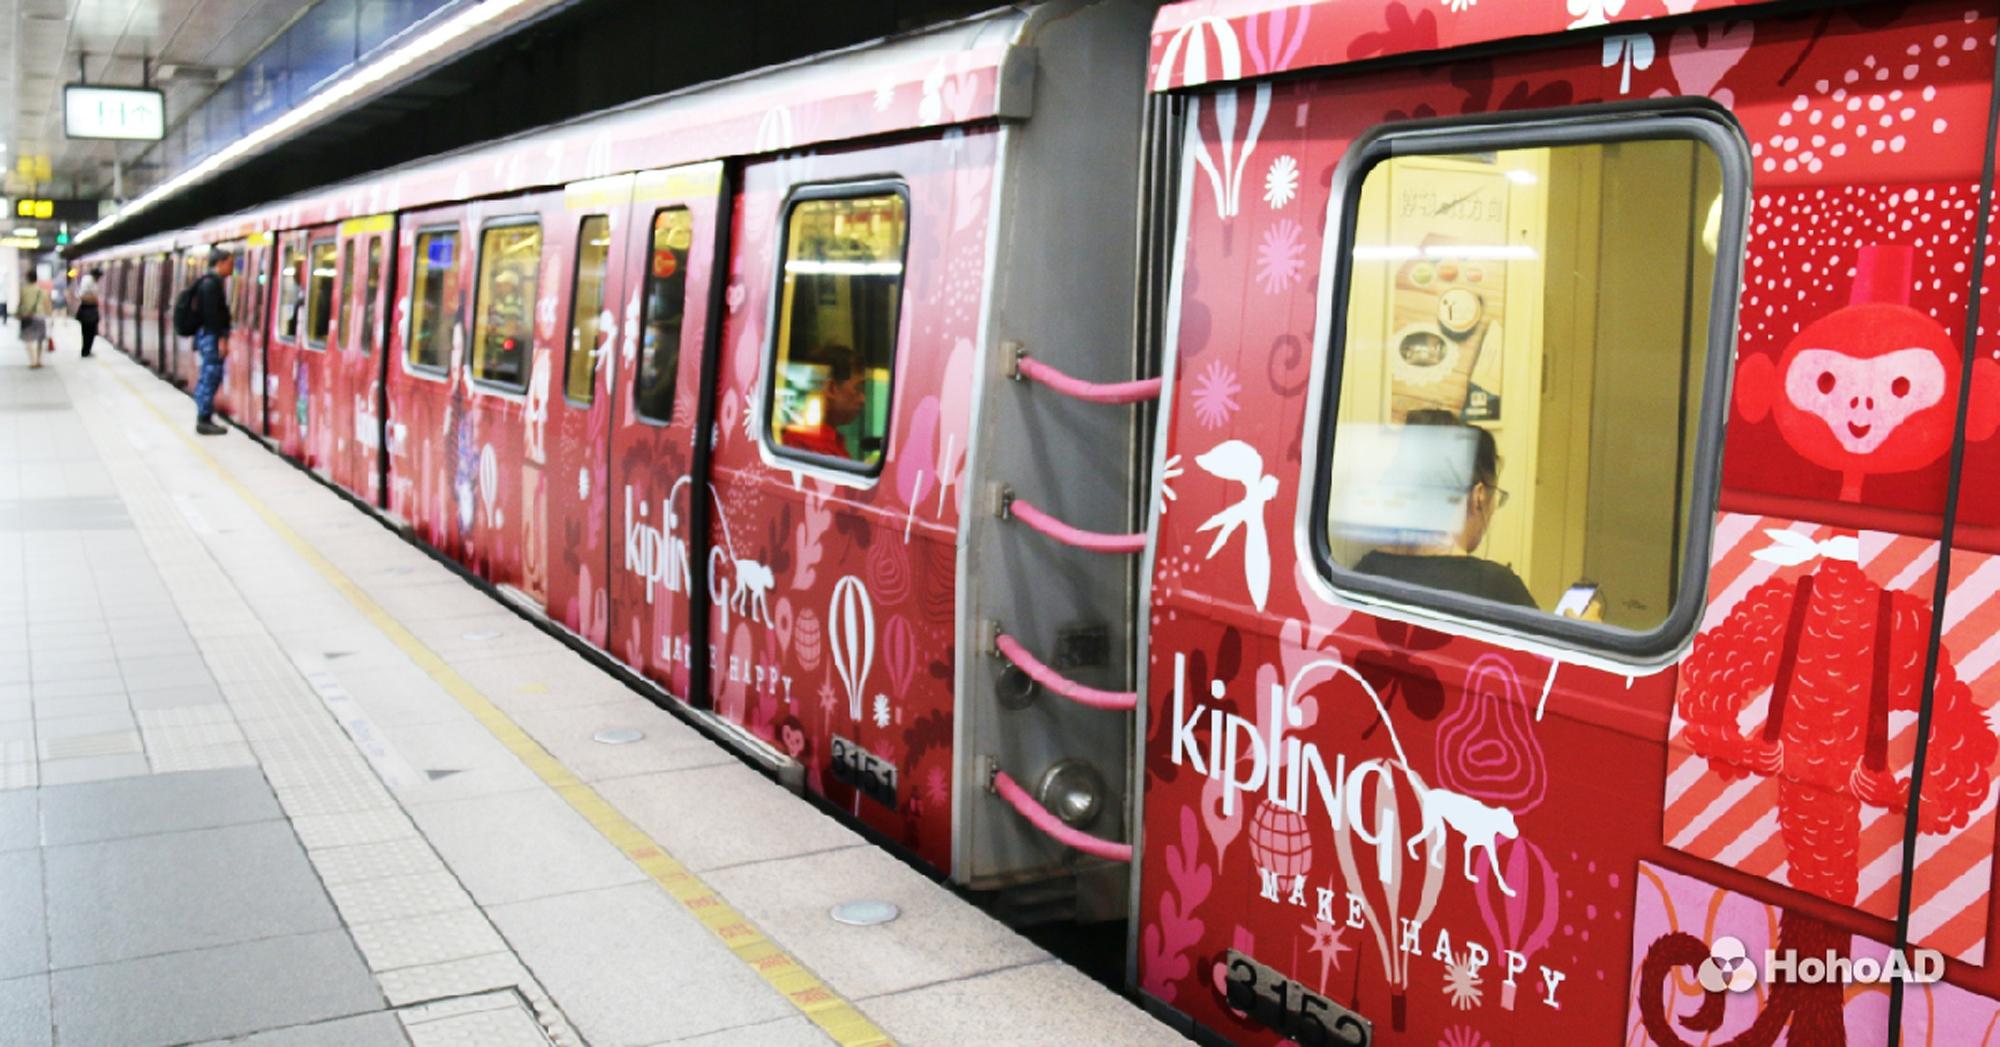 Kipling打造繽紛亮眼的彩繪列車,穿梭在台北板南線中。|合和國際 HohoAD